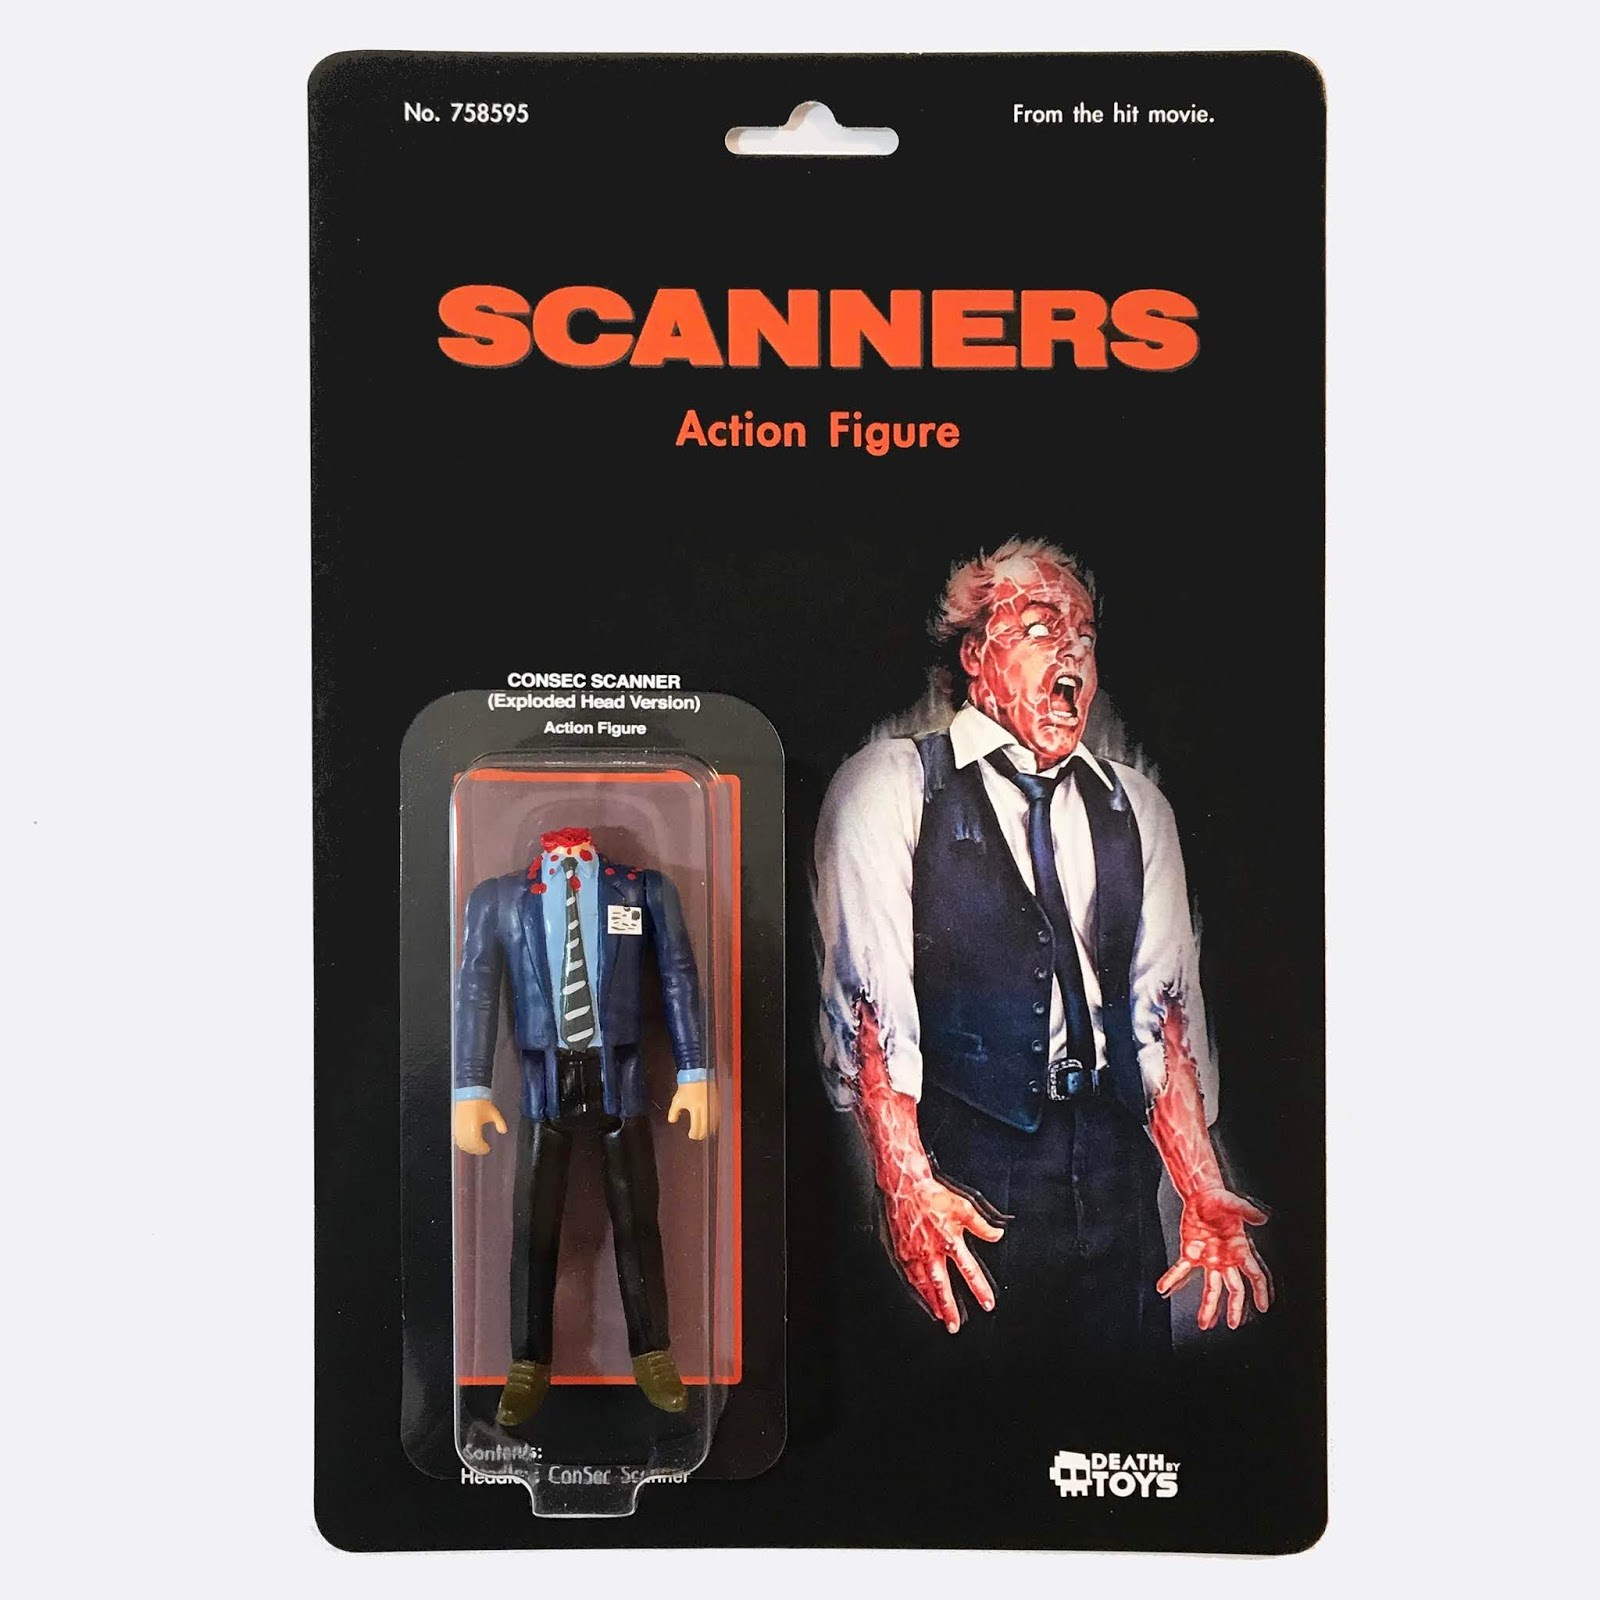 Dan Polydoris action figures customizzate morti anni '80 (8)